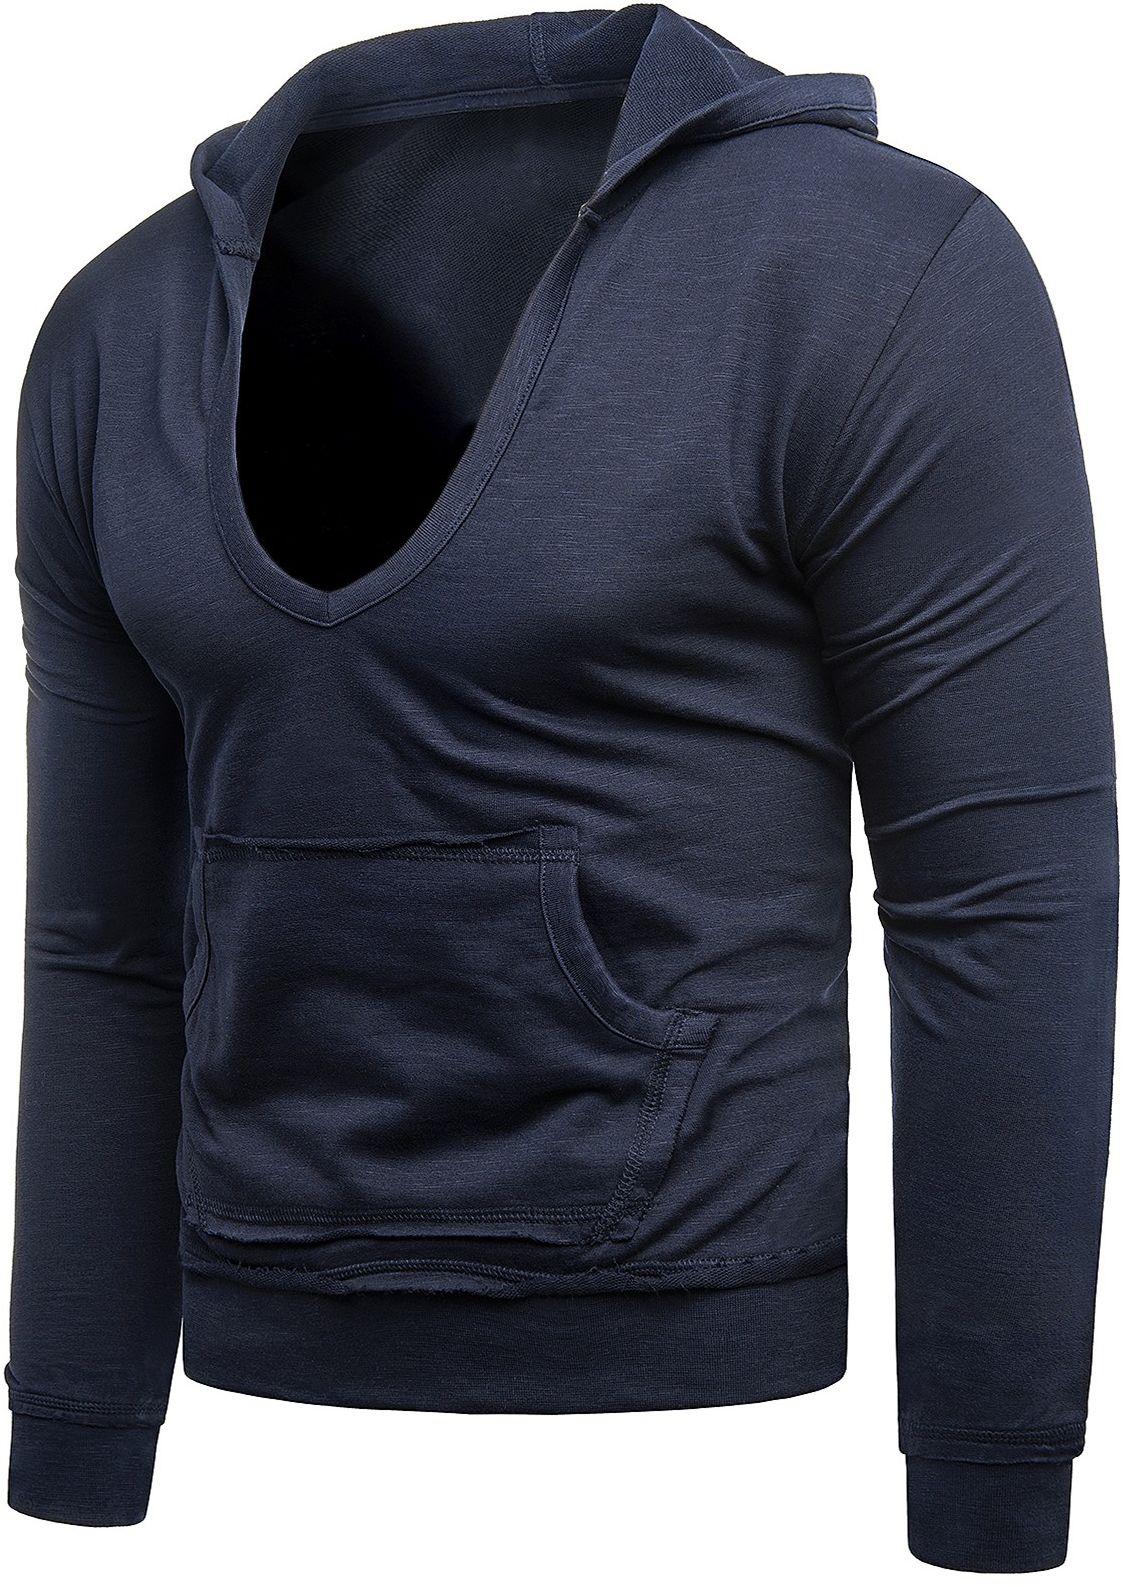 Męska bluza - ROLLY 1102 - granatowy